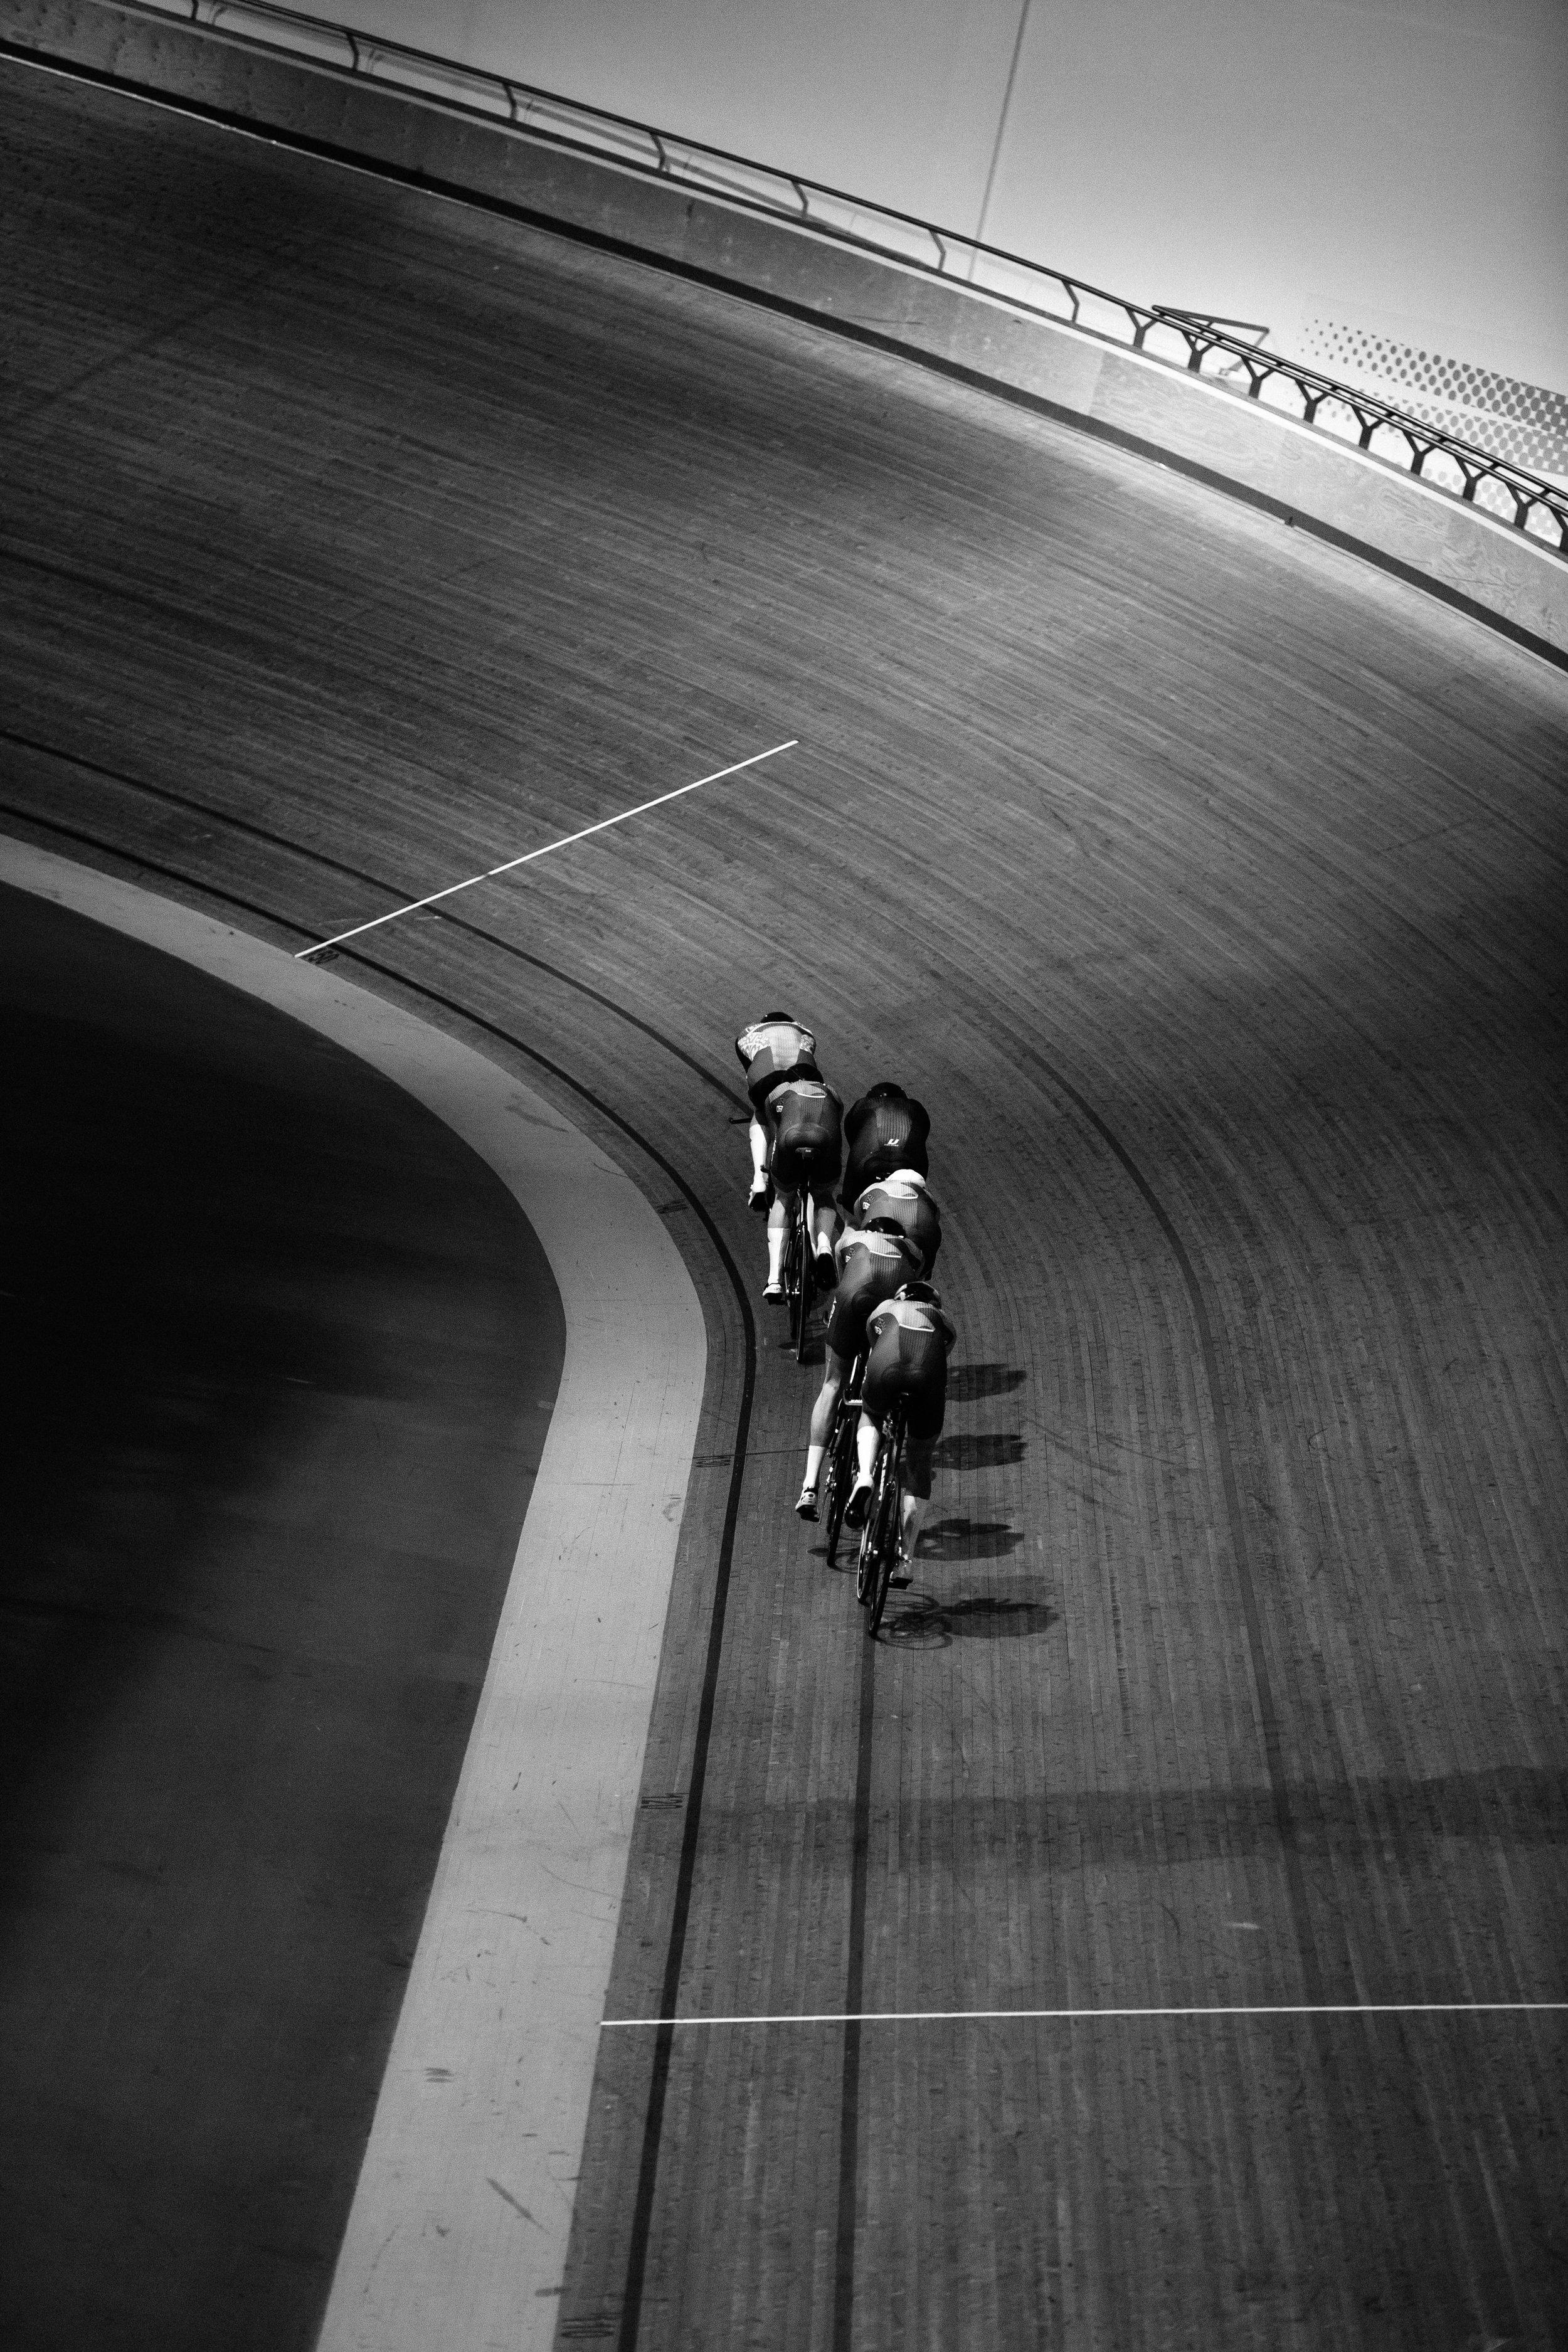 derby-velodrome-27.jpg